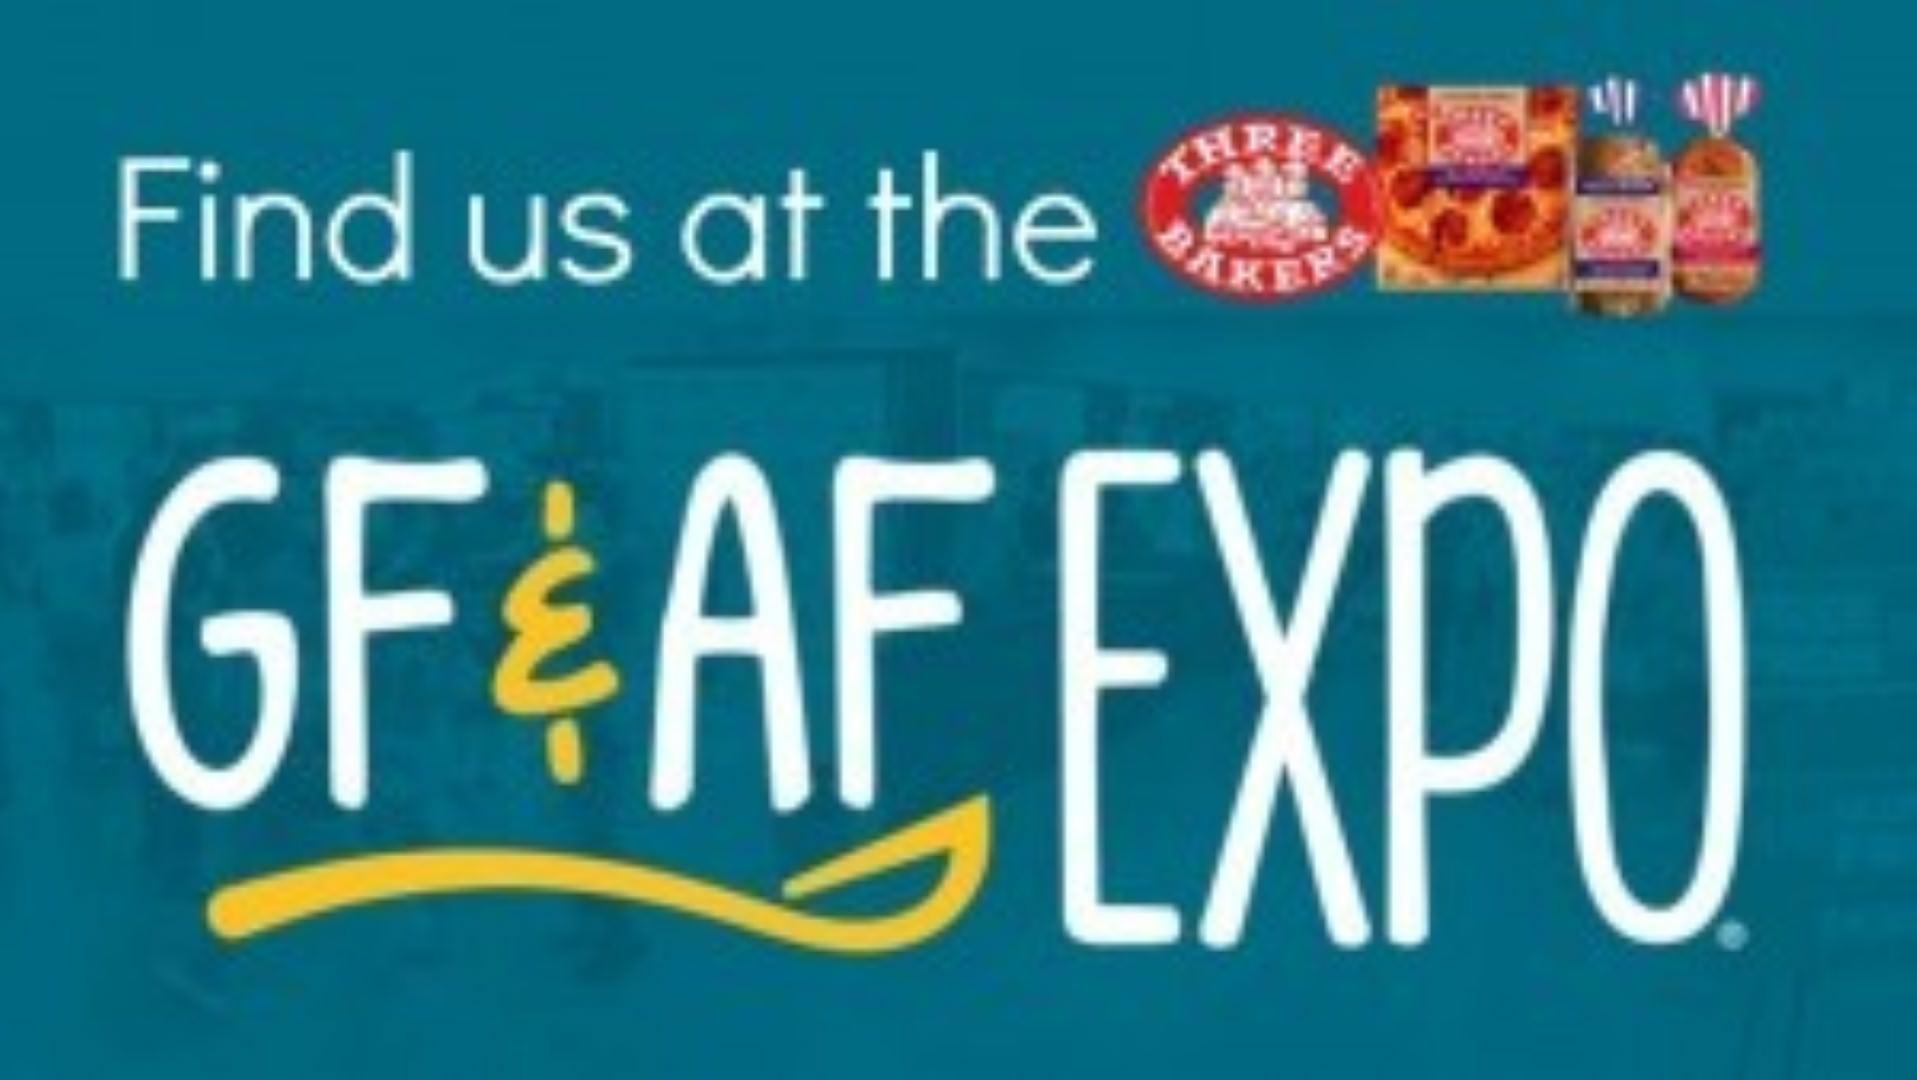 Three Bakers GFAF Expo